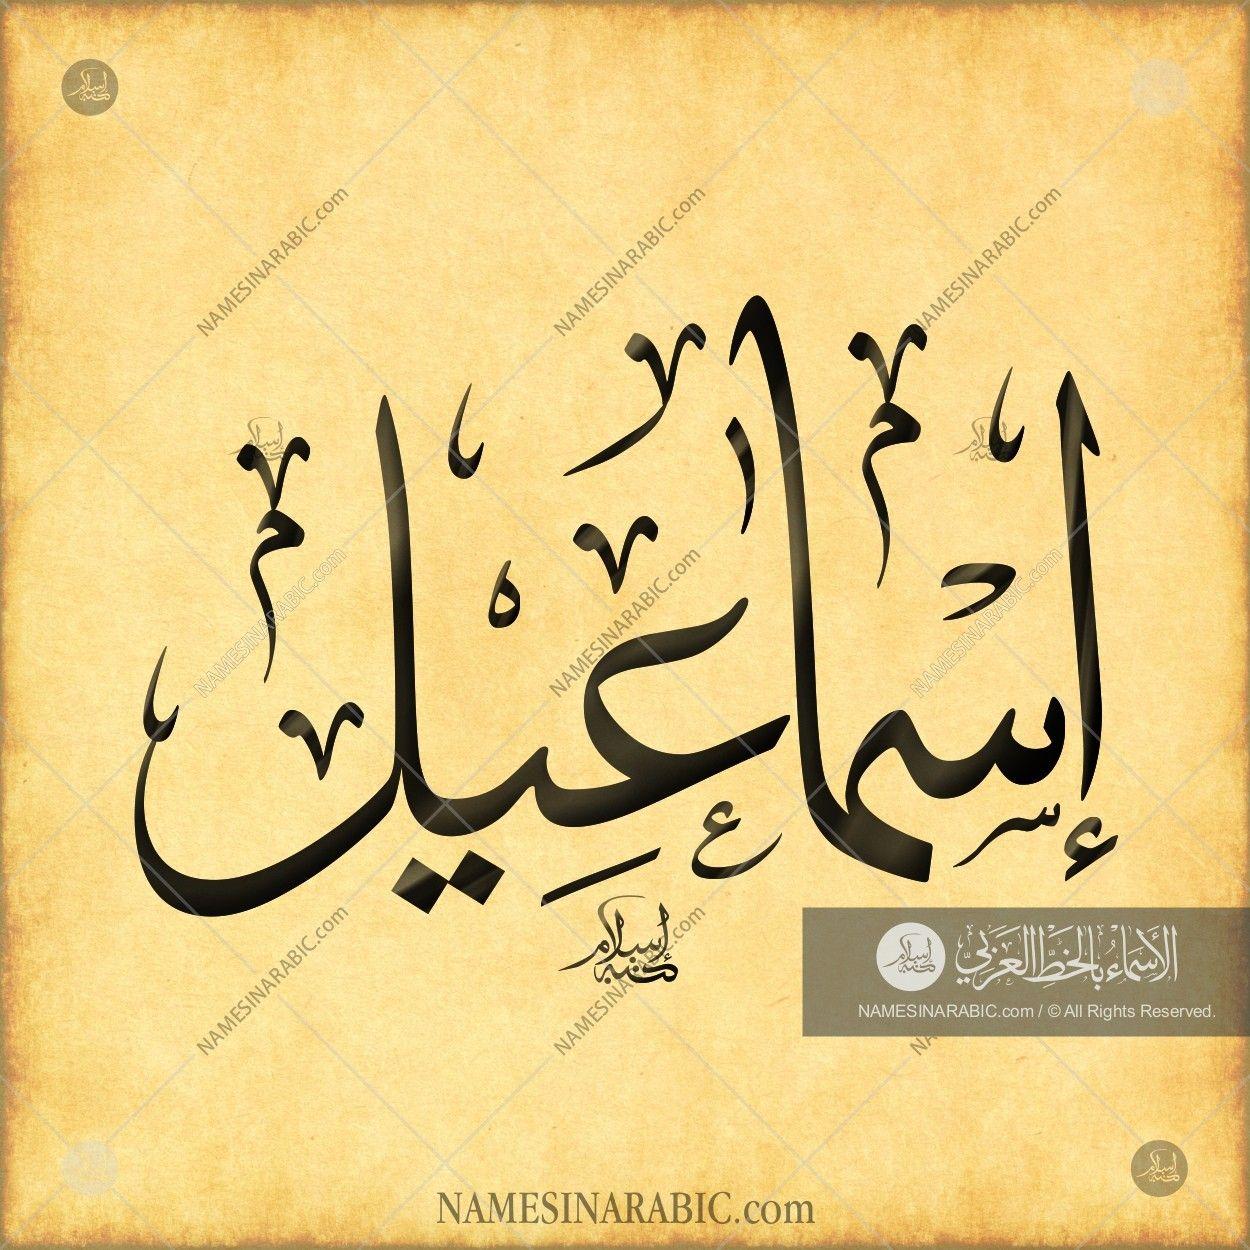 Ismail اسماعيل Names In Arabic Calligraphy Name 3821 Calligraphy Name Urdu Calligraphy Name Design Art